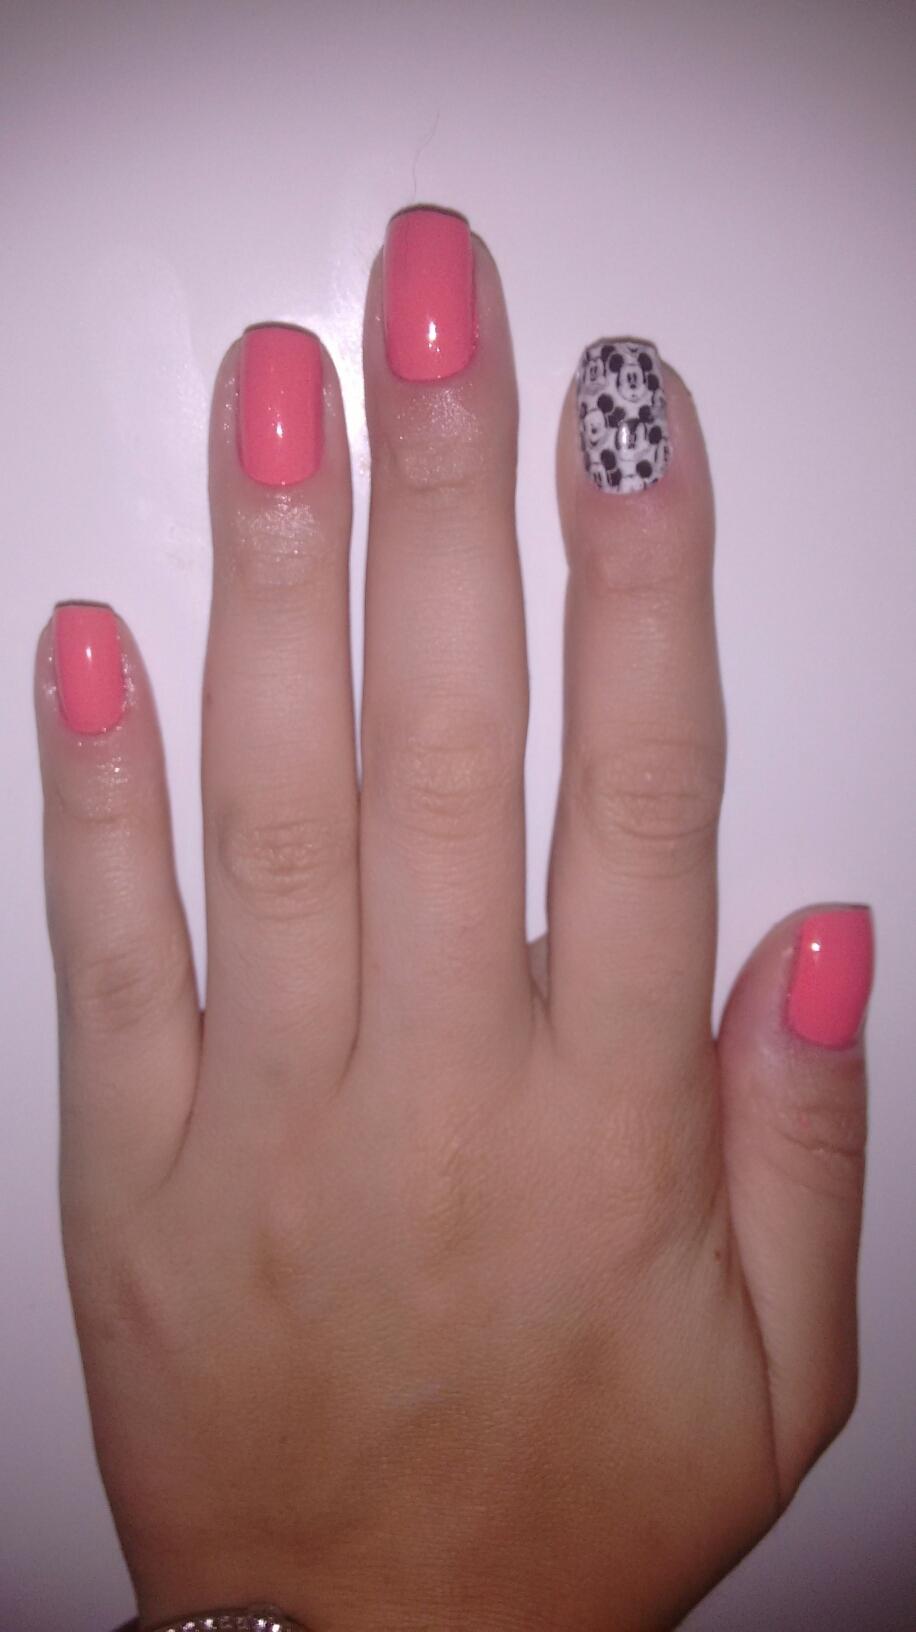 mickey, rosa delicado, rosa bebê unhas  manicure e pedicure